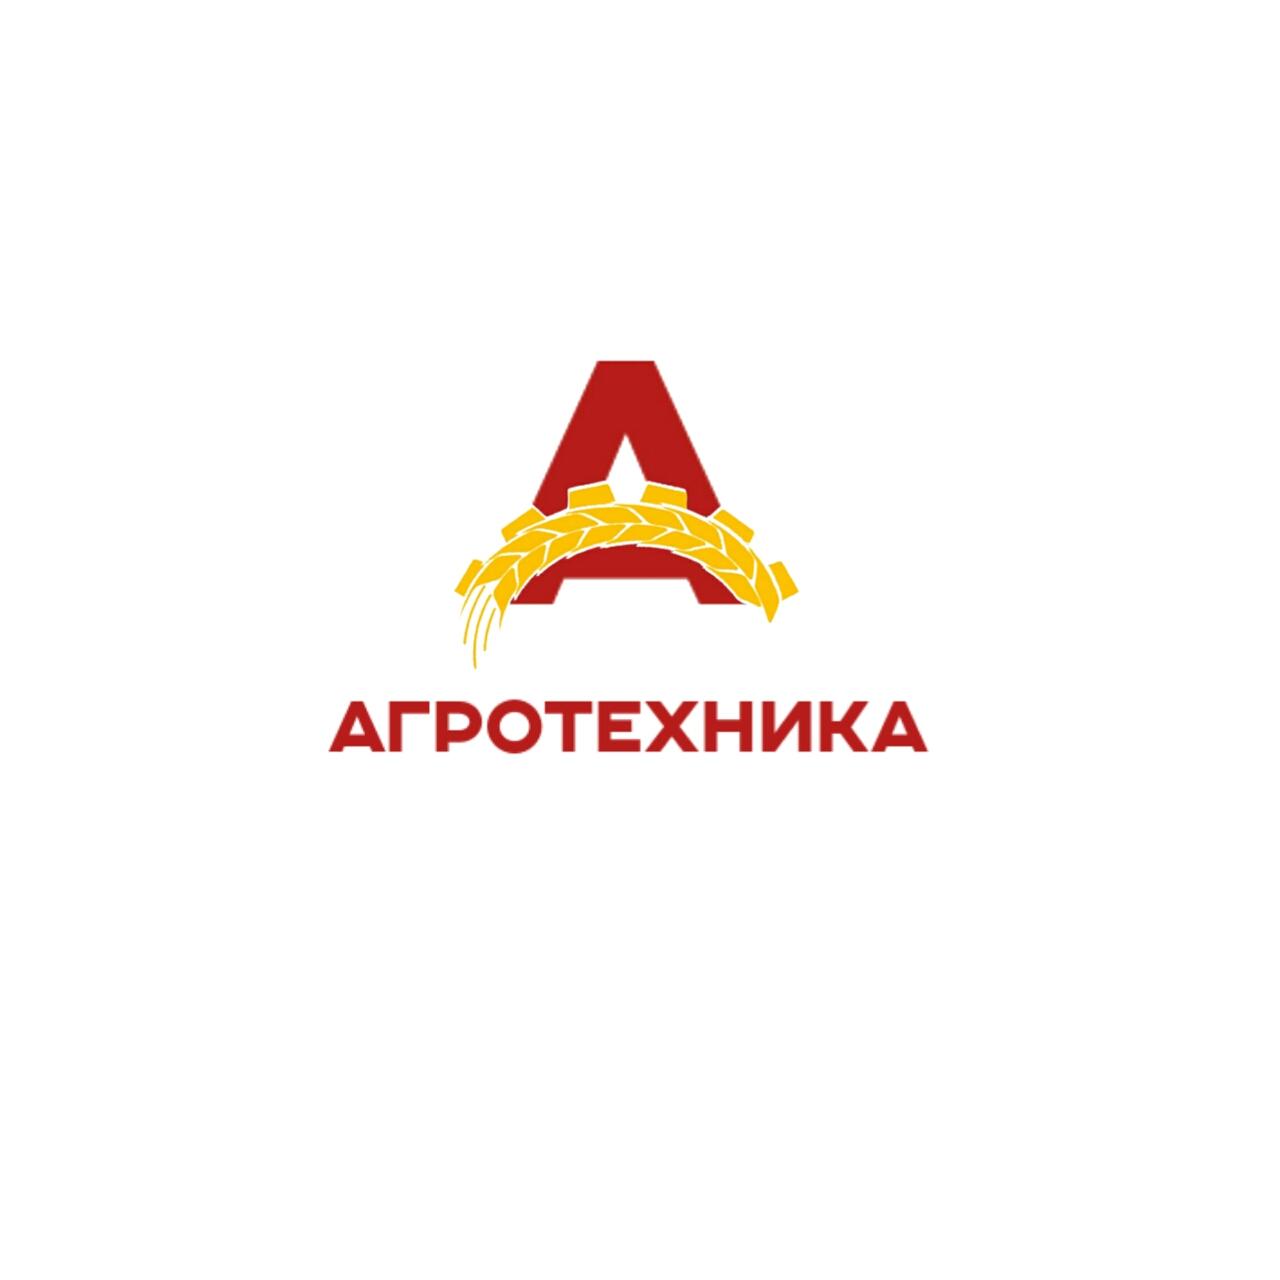 Разработка логотипа для компании Агротехника фото f_4655bfffde486a4a.jpg